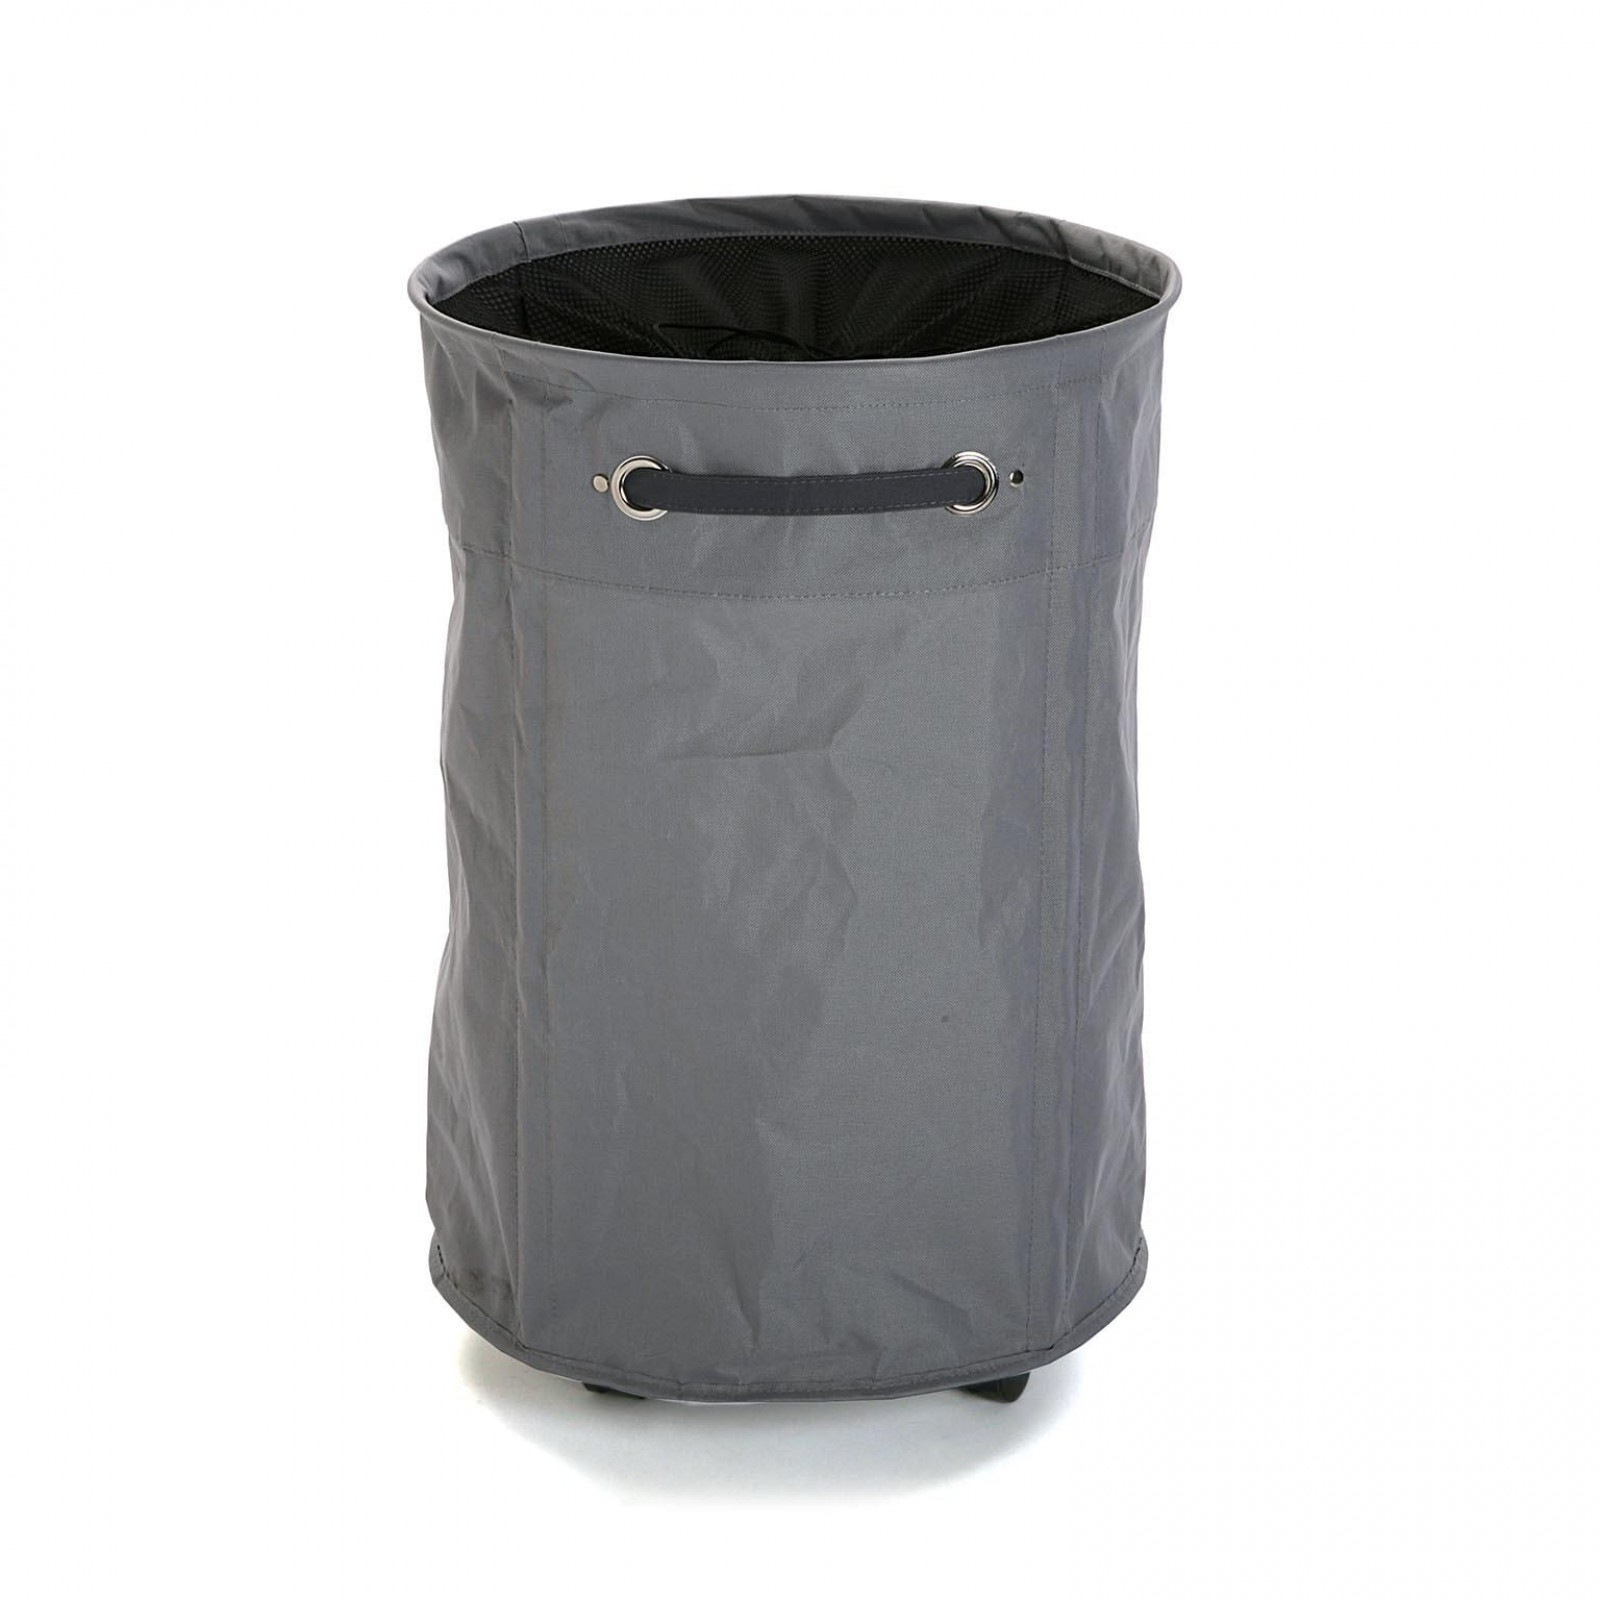 Round Laundry Basket with Wheels (Grey) - Versa